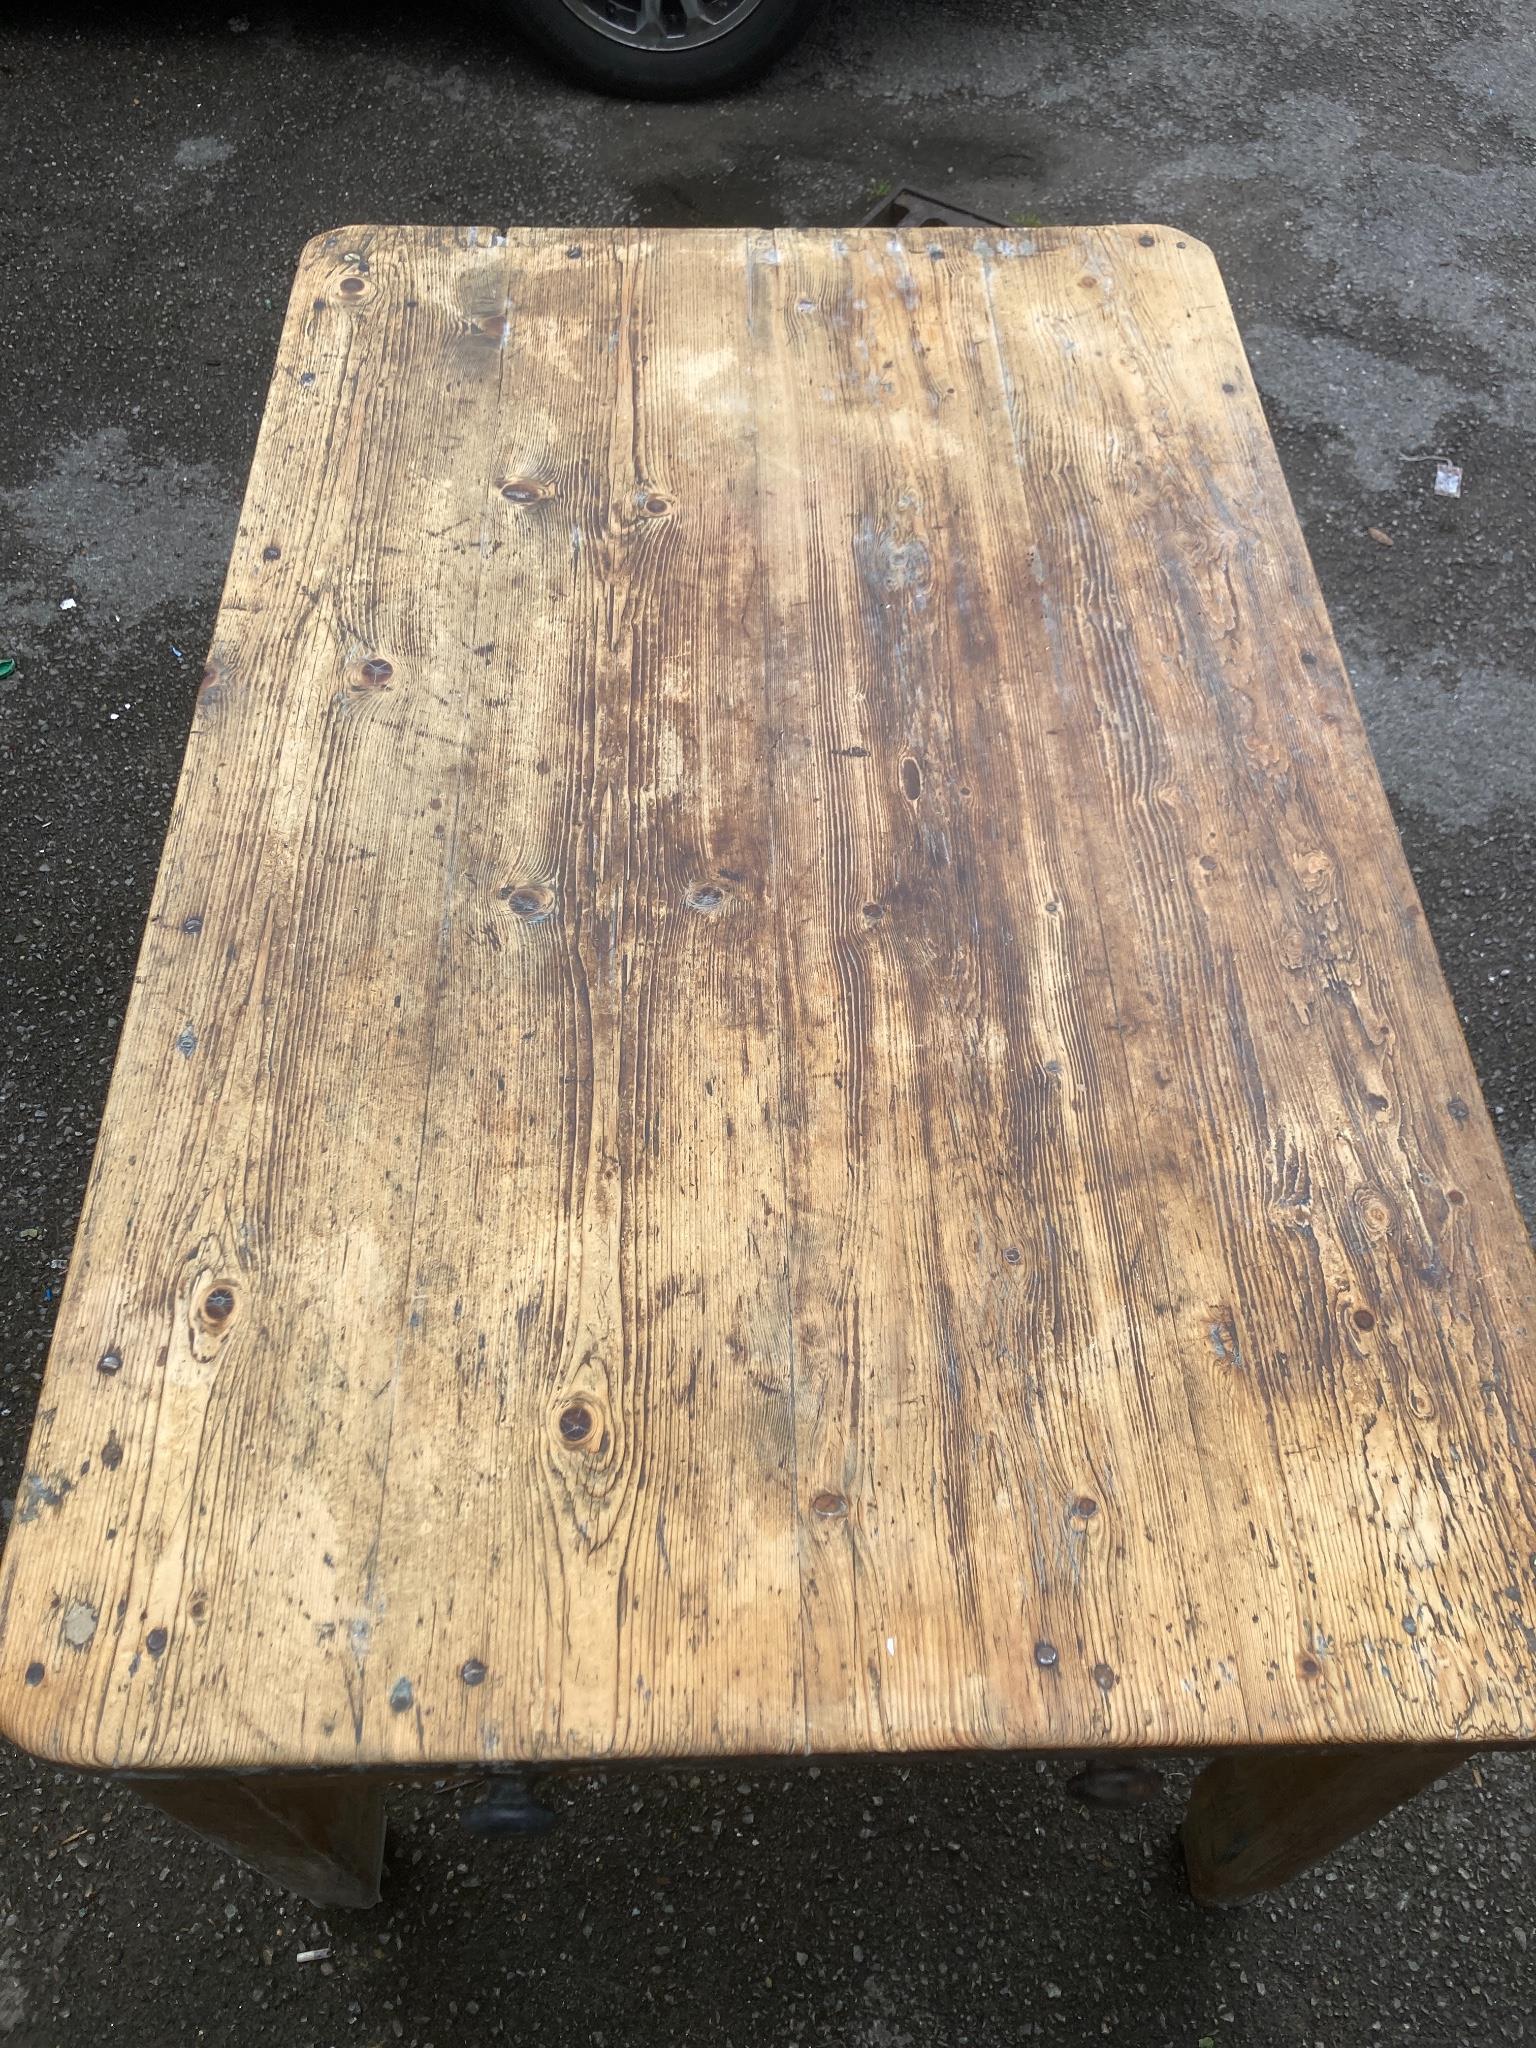 A Victorian rectangular pine kitchen table, width 132cm, depth 82cm, height 75cm - Image 3 of 3